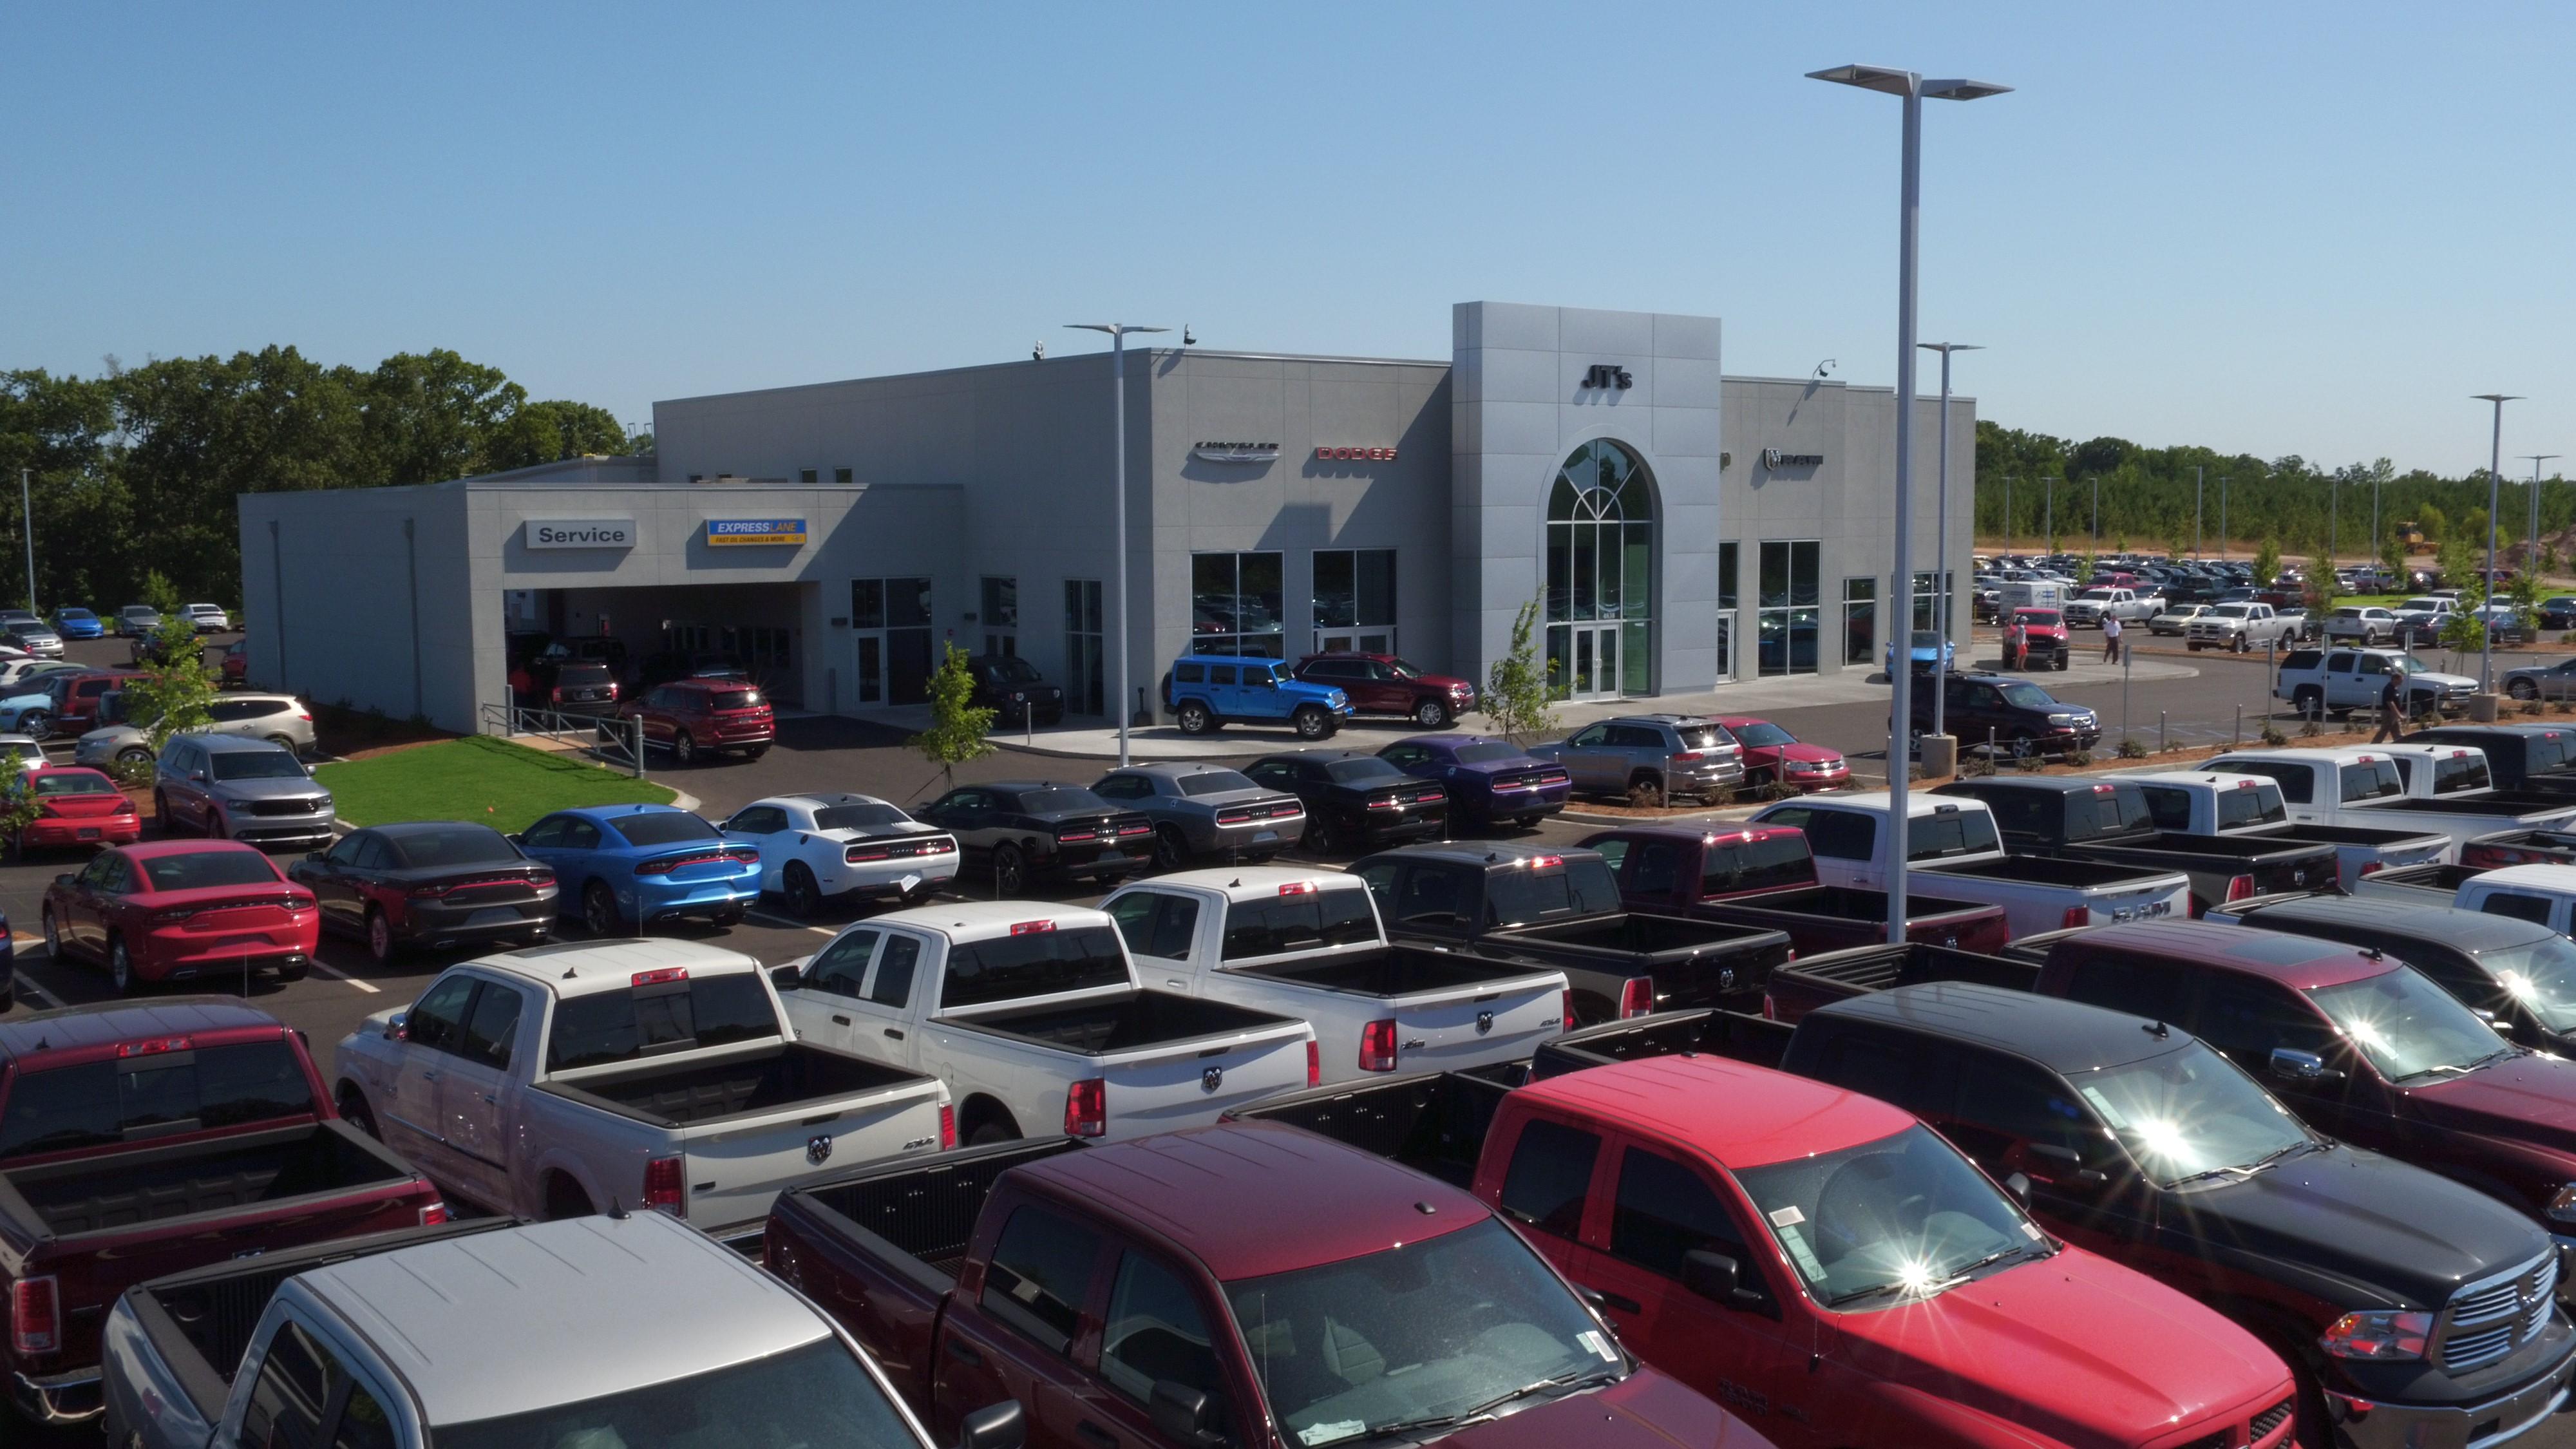 Lexington Car Dealerships: JT's Chrysler Dodge Jeep Ram FIAT